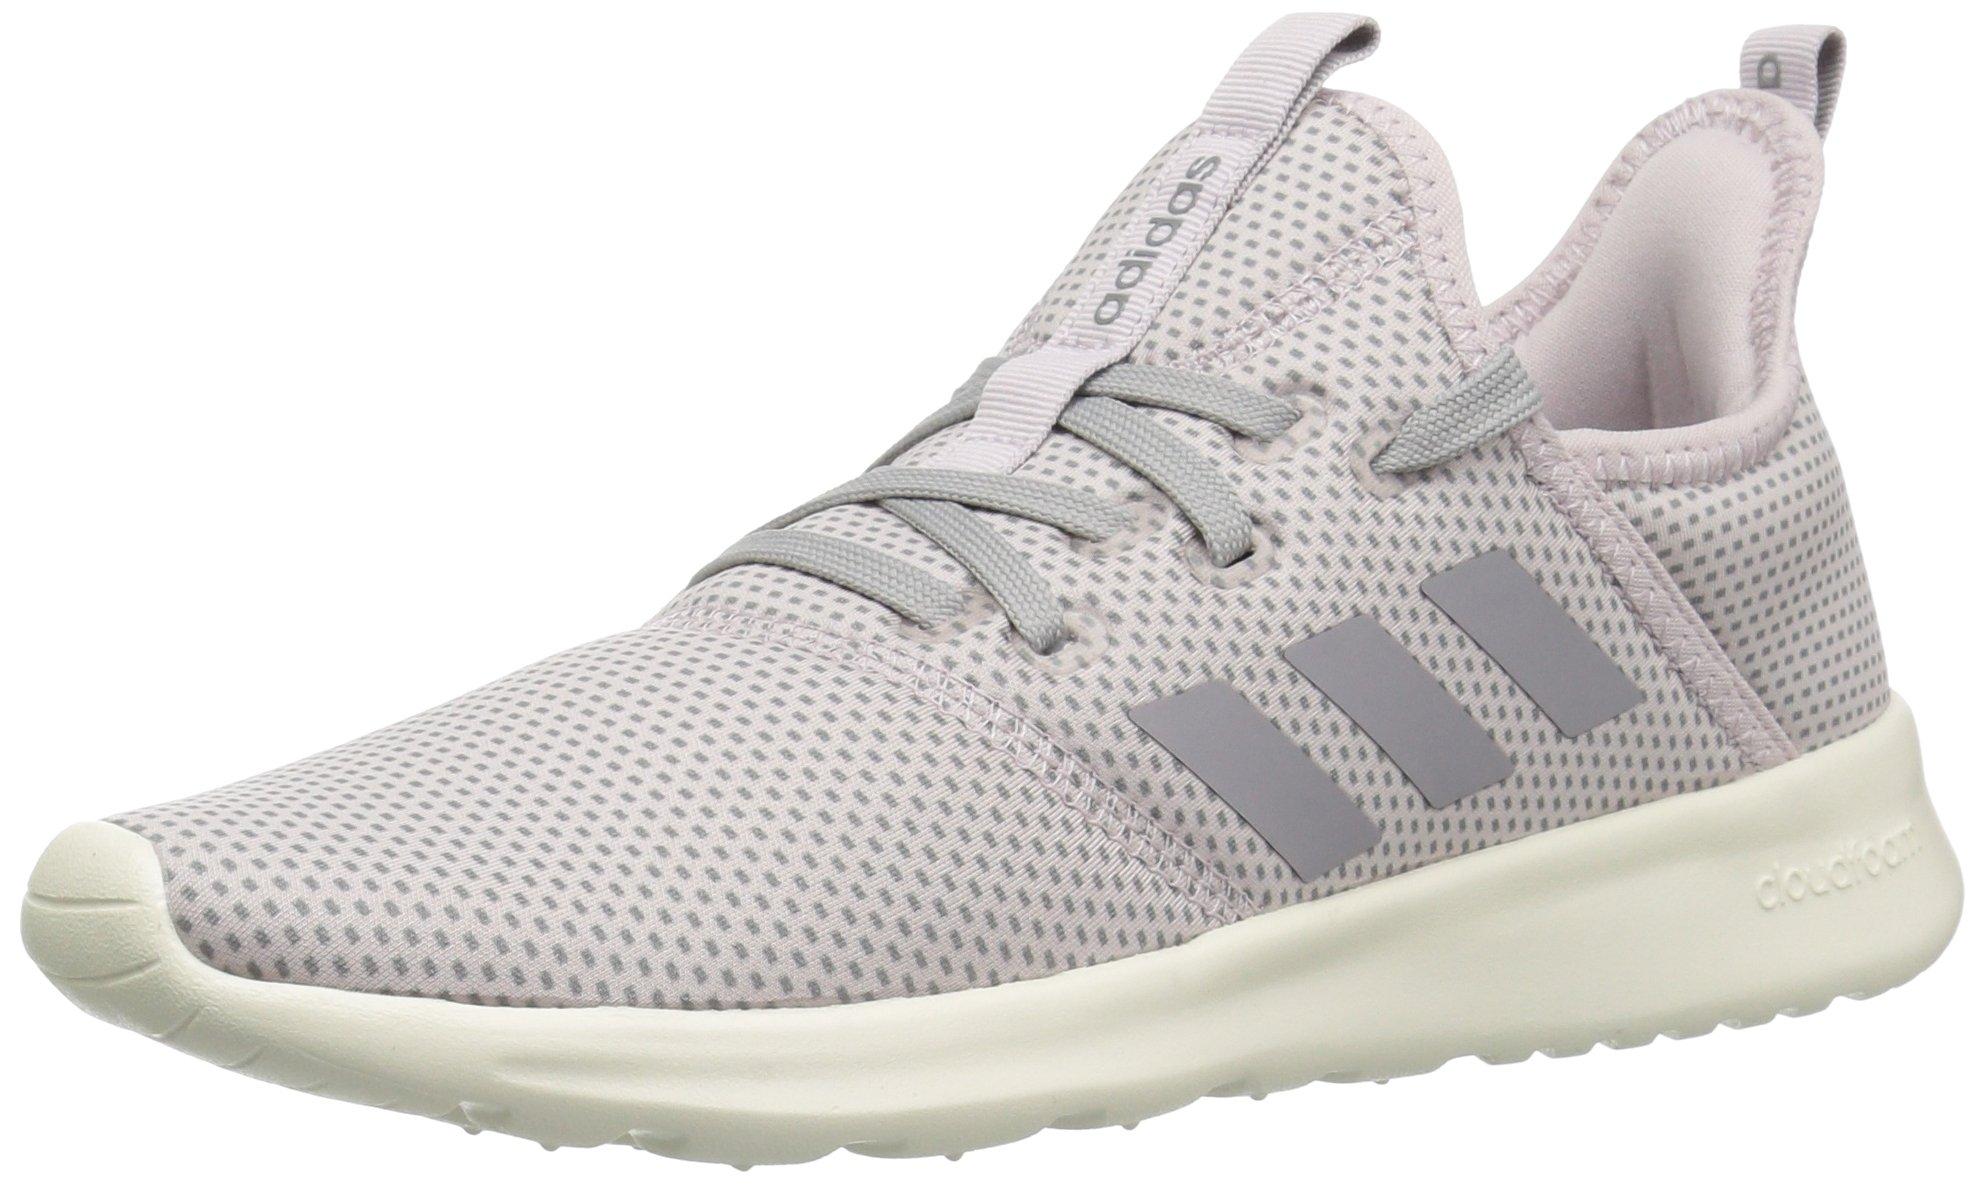 adidas Performance Women's Cloudfoam Pure Running Shoe, Ice Purple/Grey/White, 5 M US by adidas (Image #1)